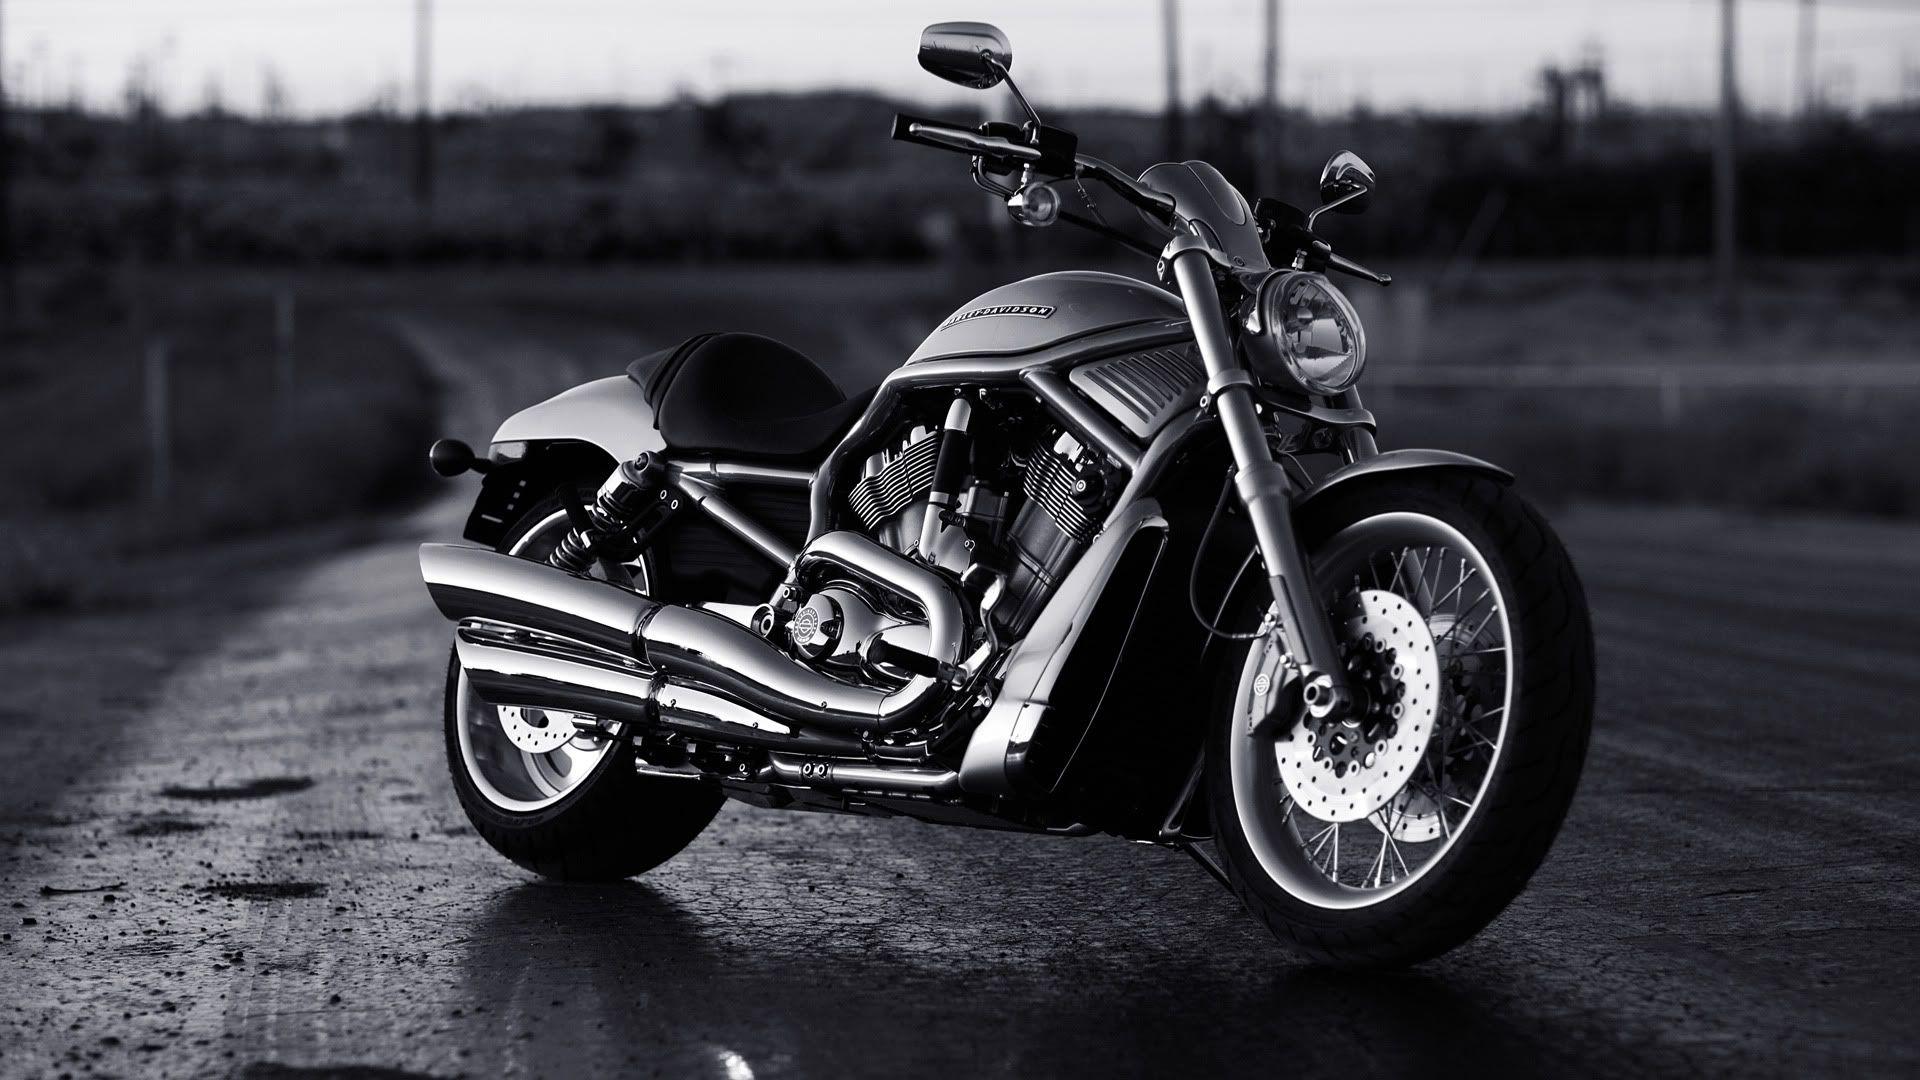 Harley Davidson V Rod Muscle Wallpapers - Wallpaper Cave